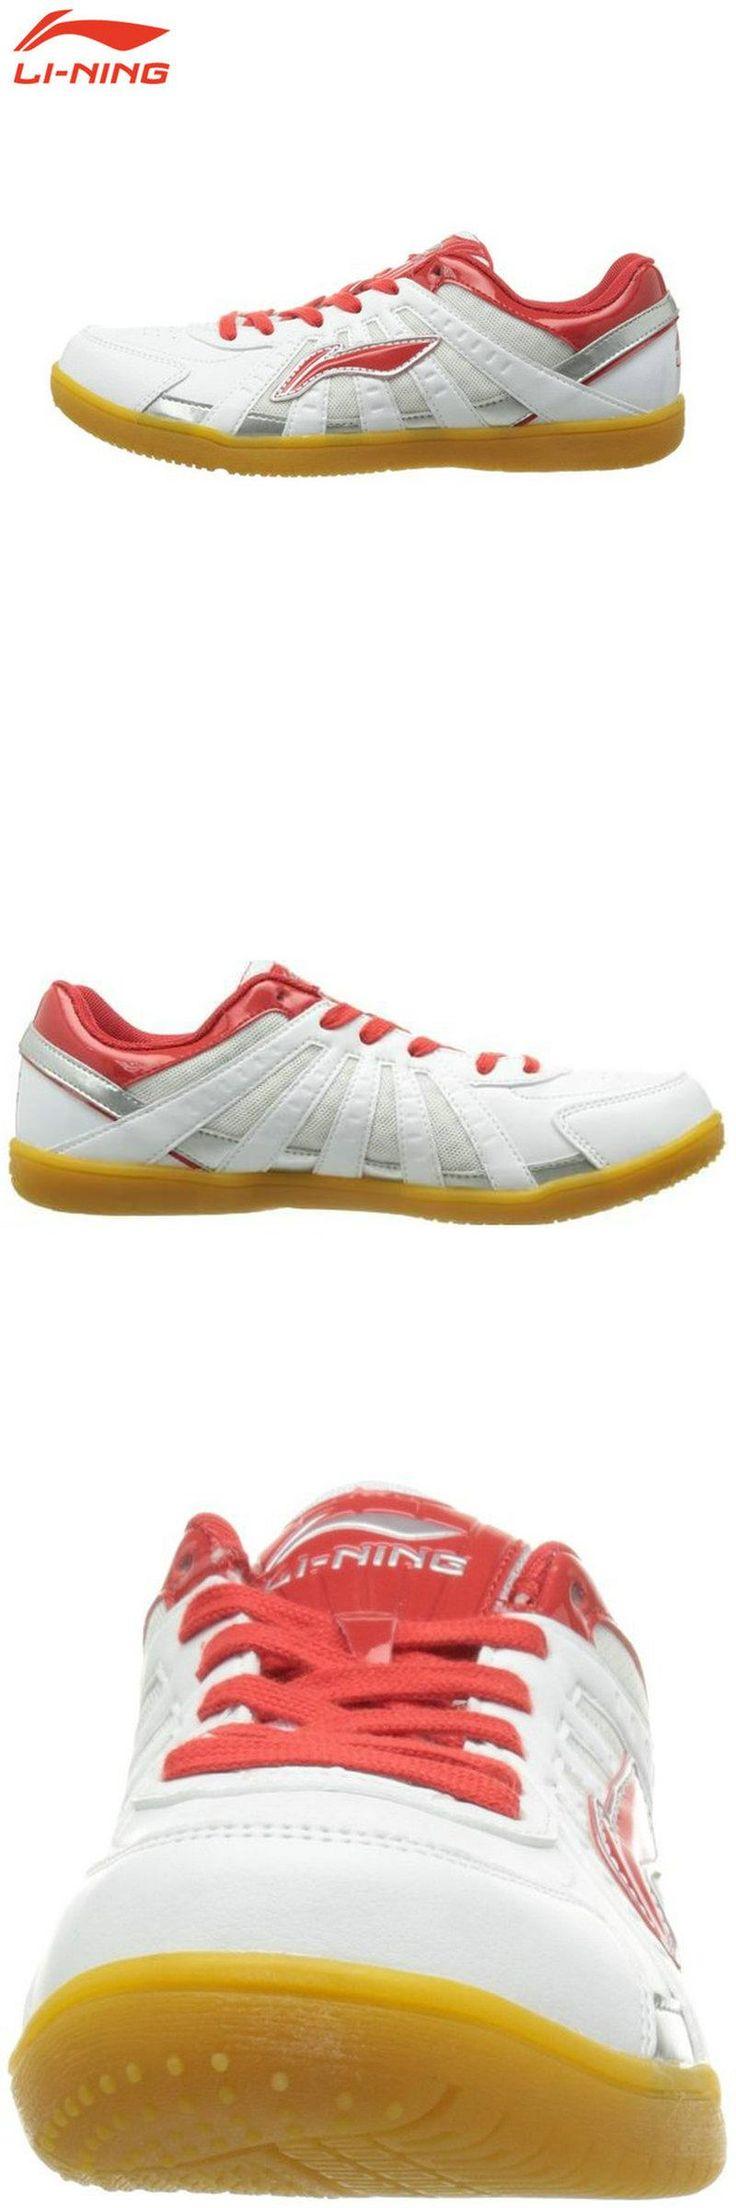 [Visit to Buy] Li Ning Original Brand Men men Table tennis shoes room Training Shoes White Breathable Sneakers ASNH009 #Advertisement